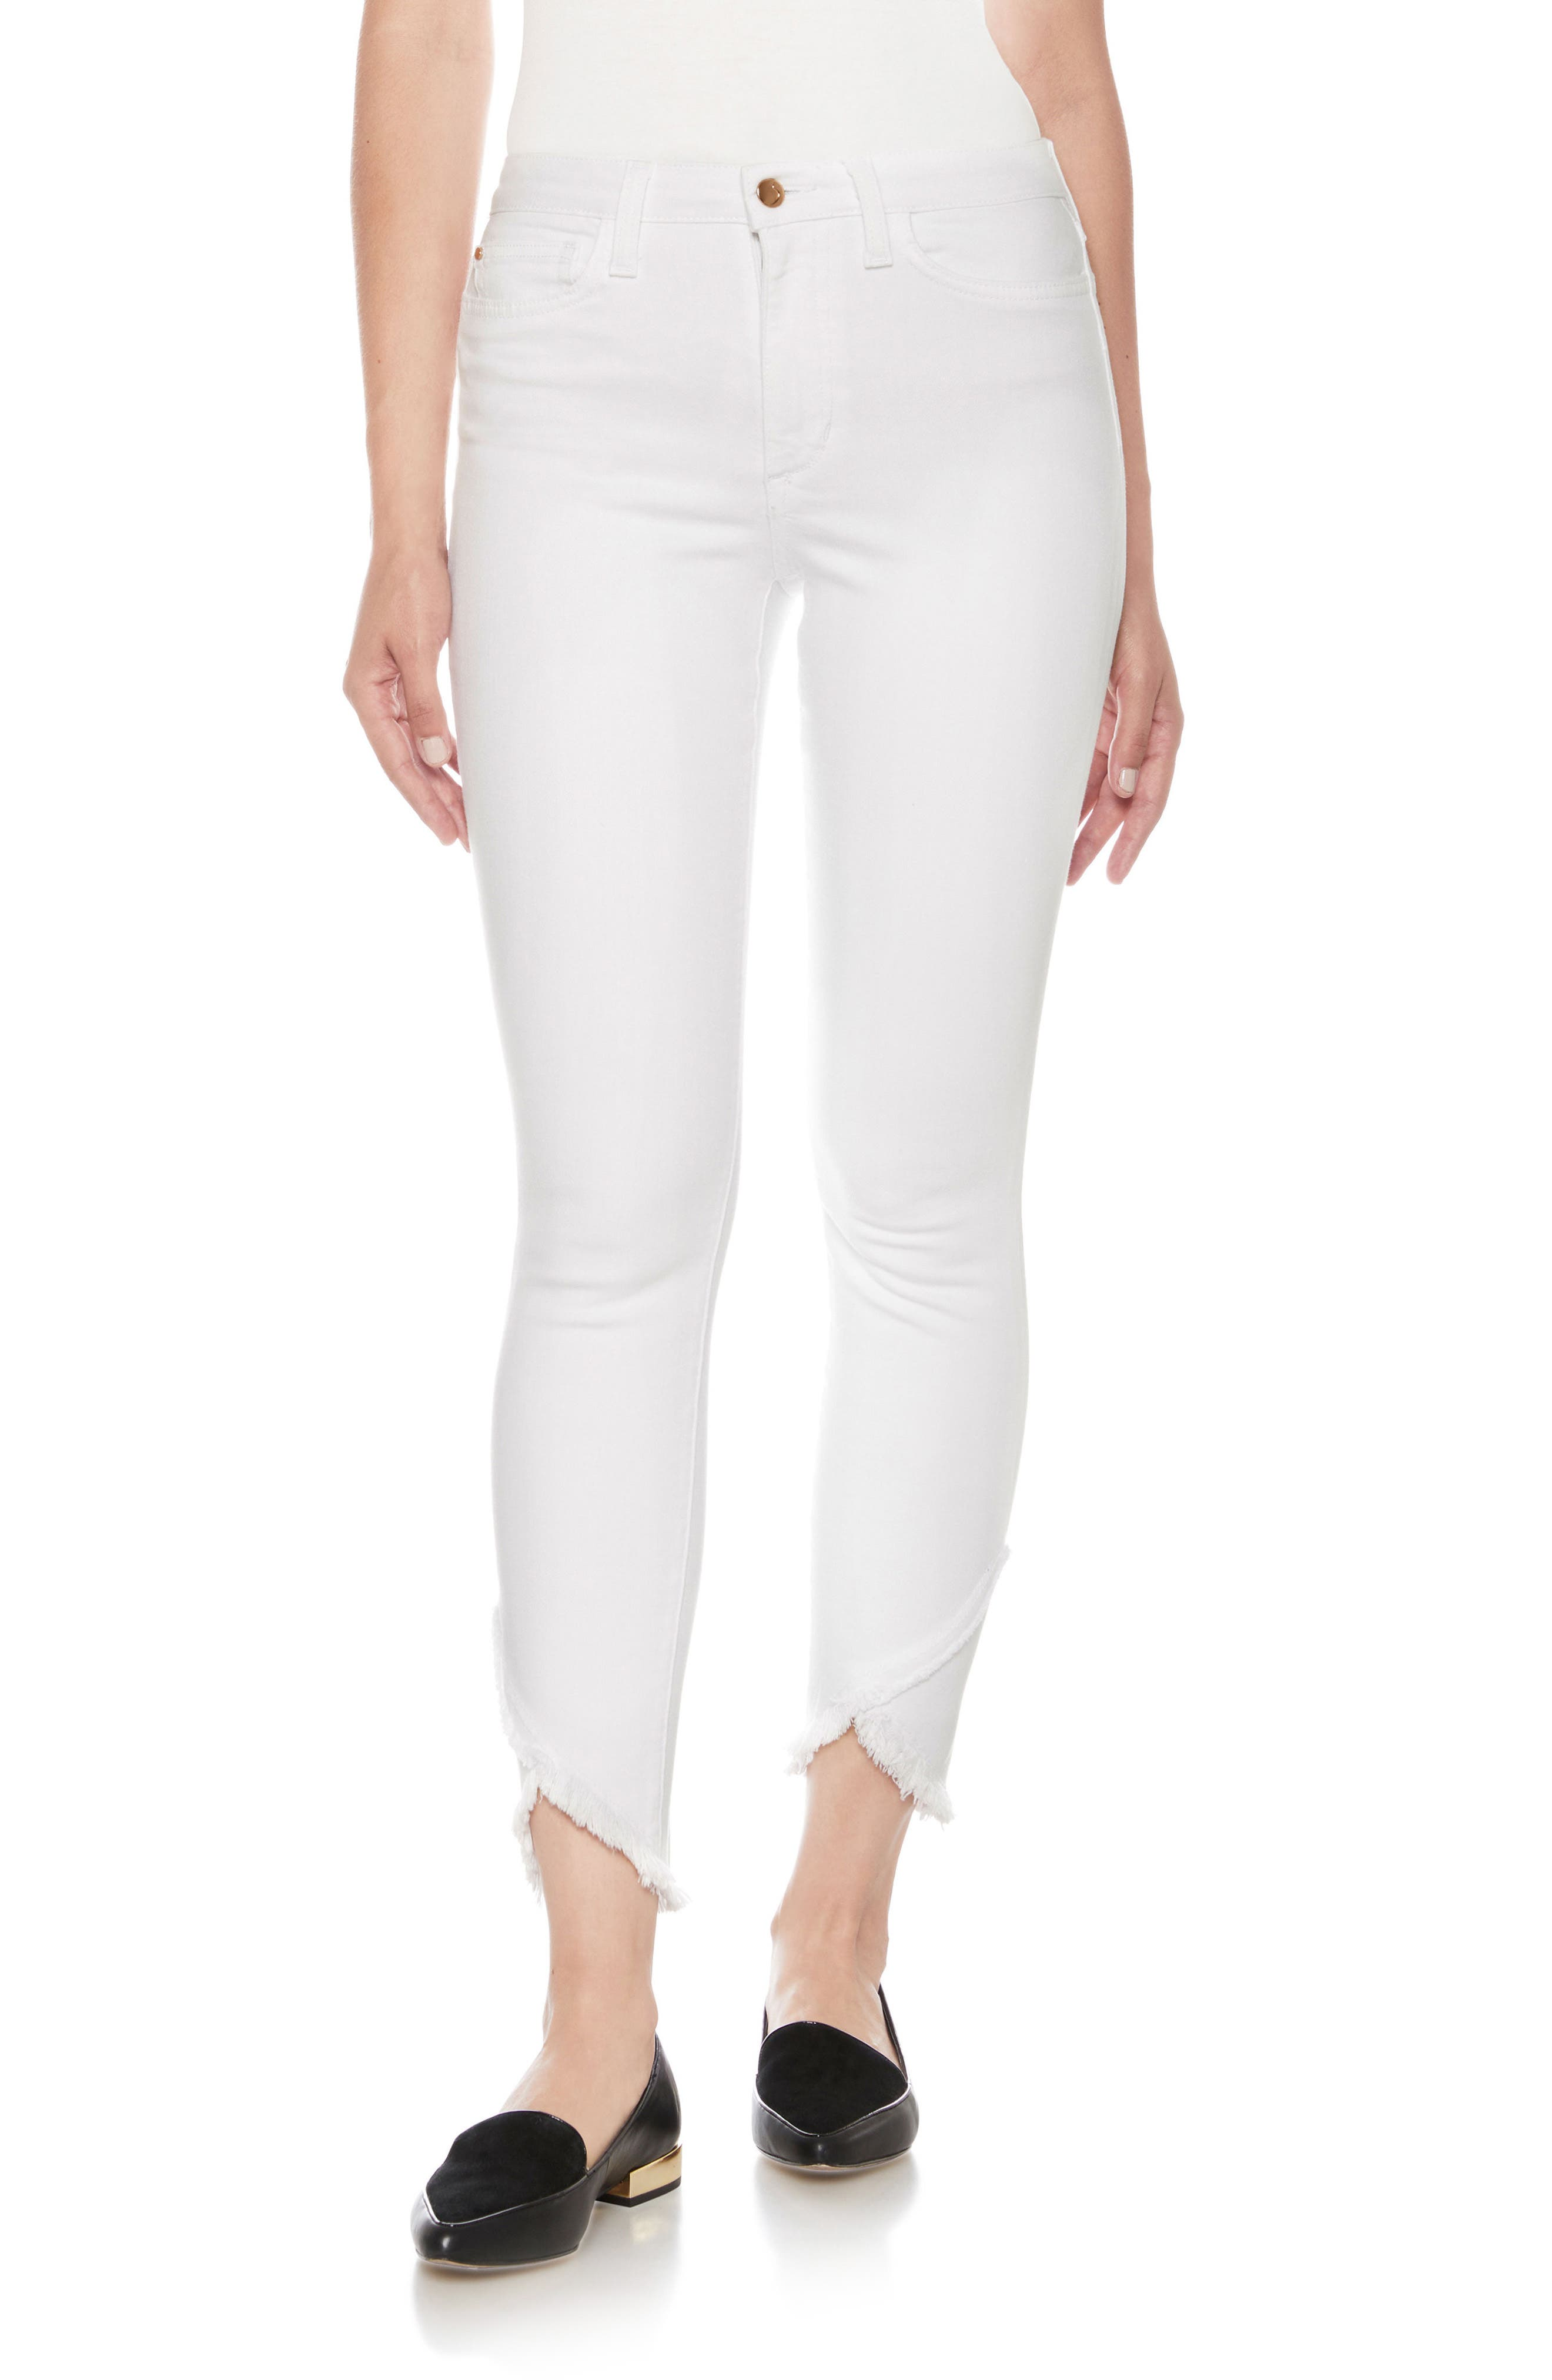 Main Image - Joe's Flawless - Charlie High Waist Tulip Hem Ankle Skinny Jeans (Hennie)